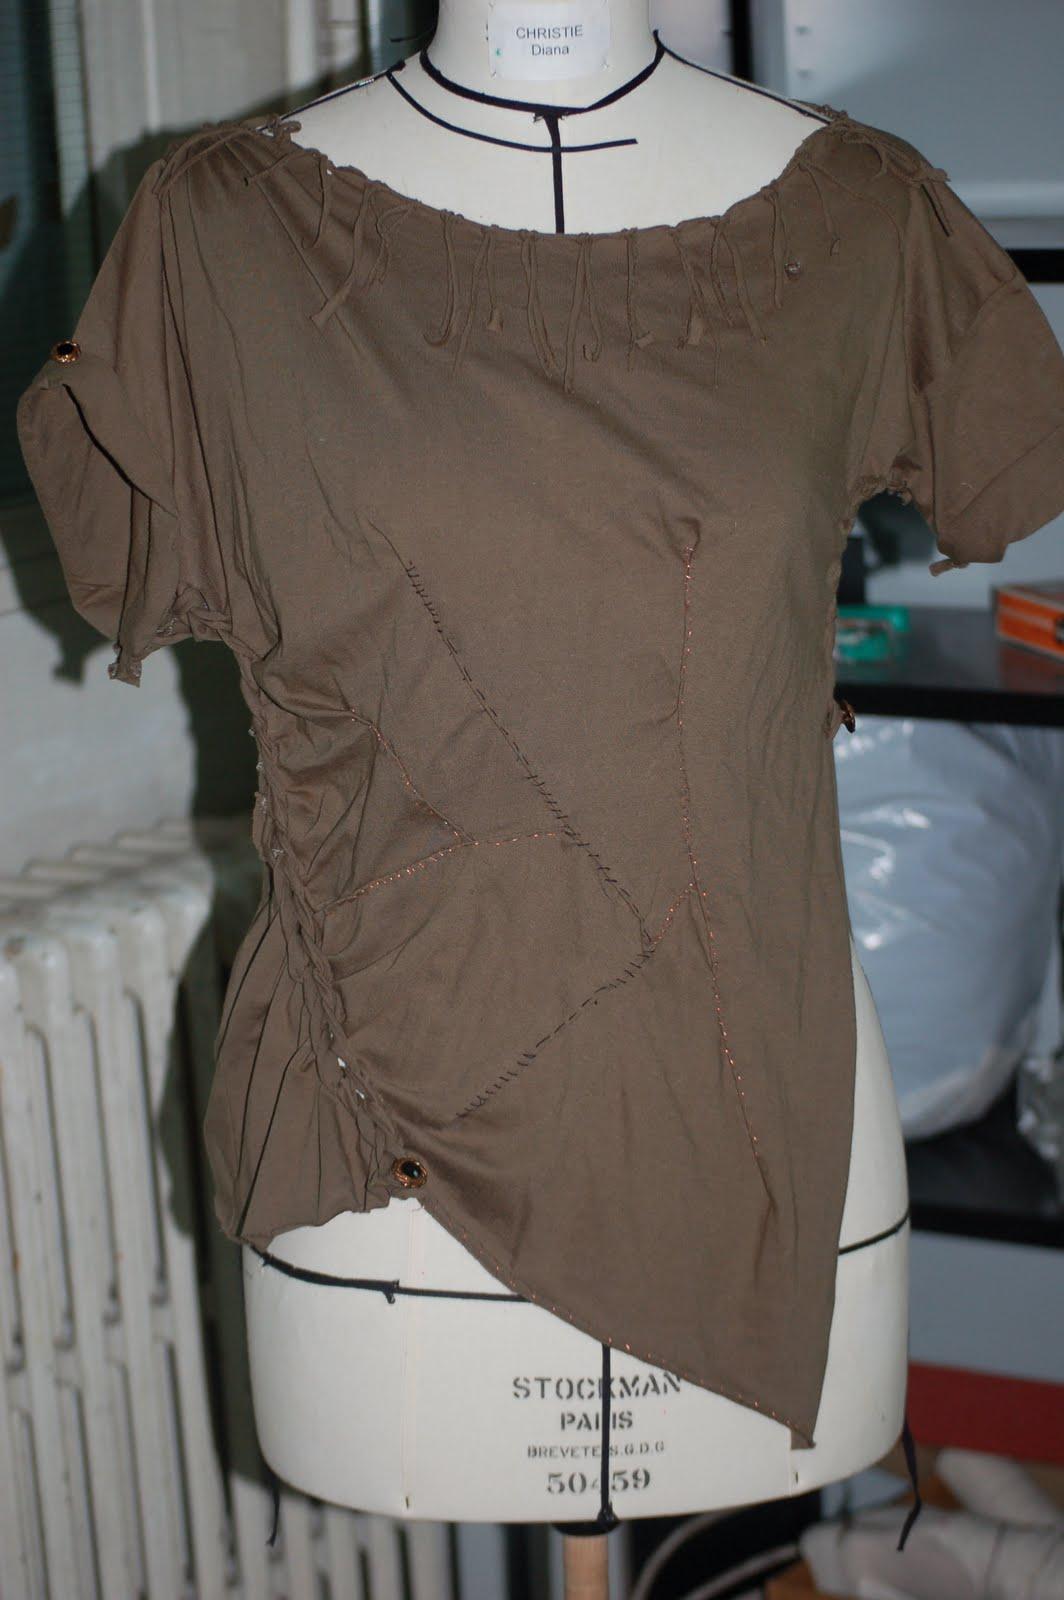 gg paris t shirt redesign